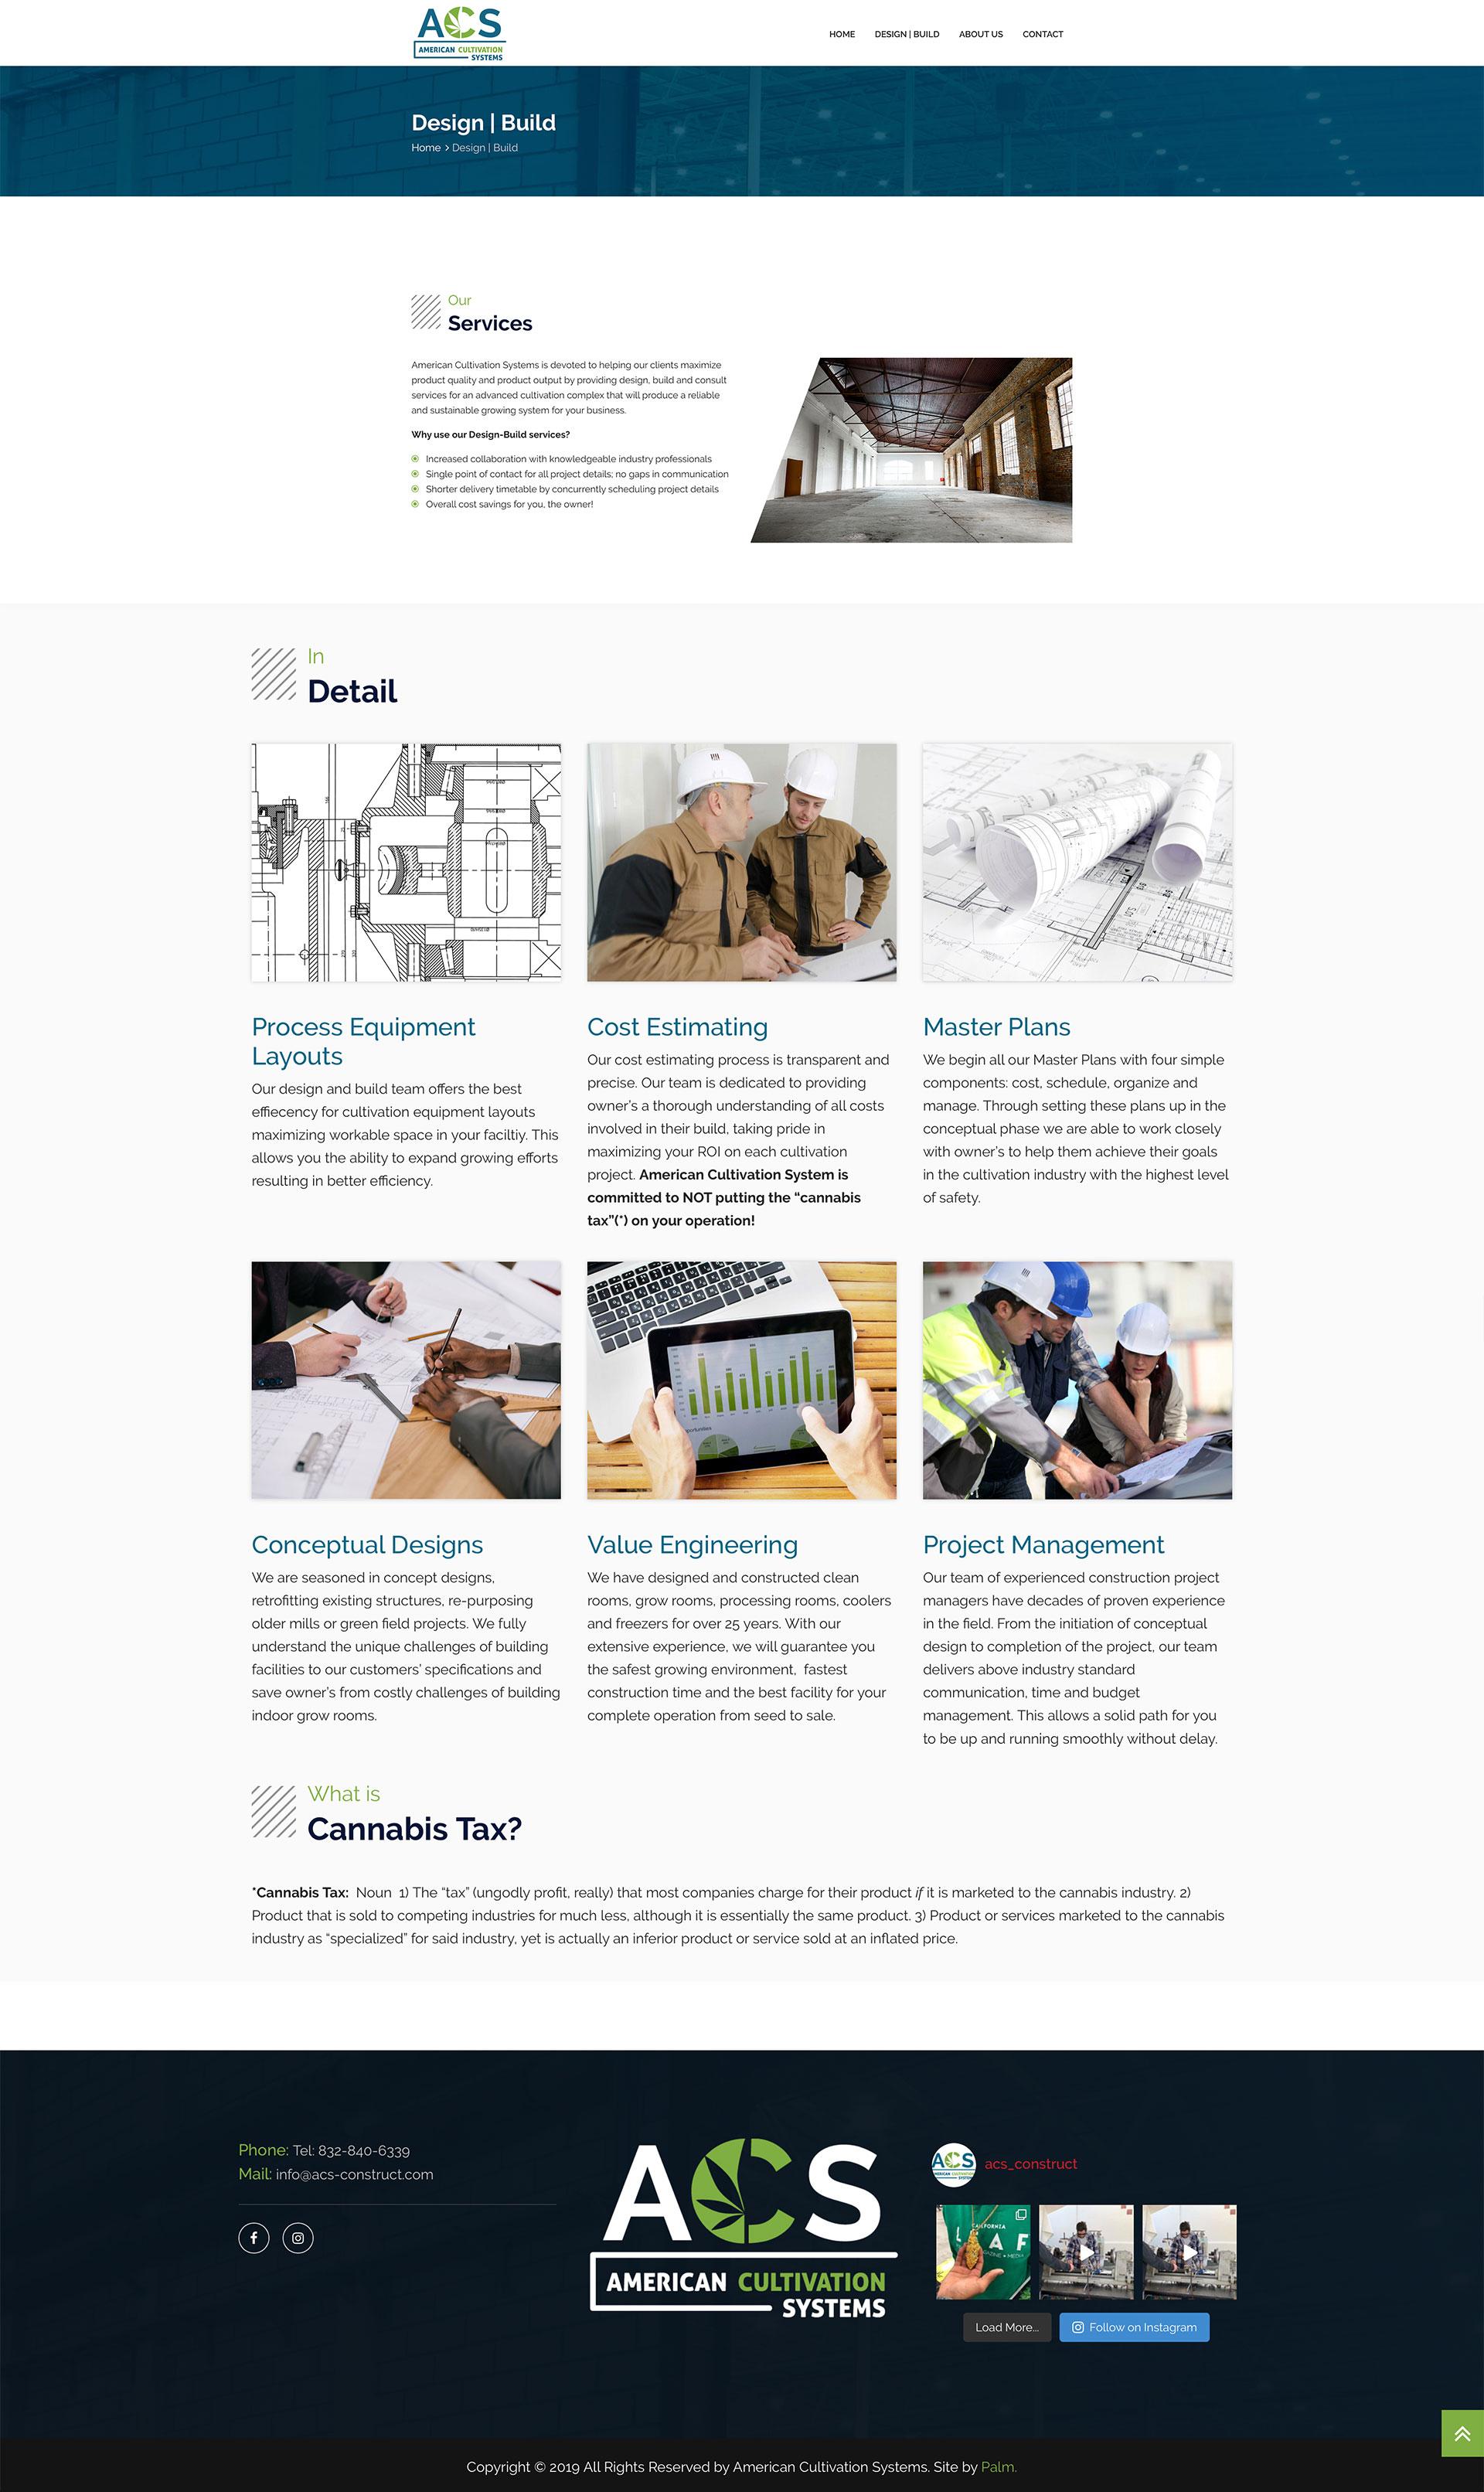 ACS-Web-Mockup-DESIGNBUILD